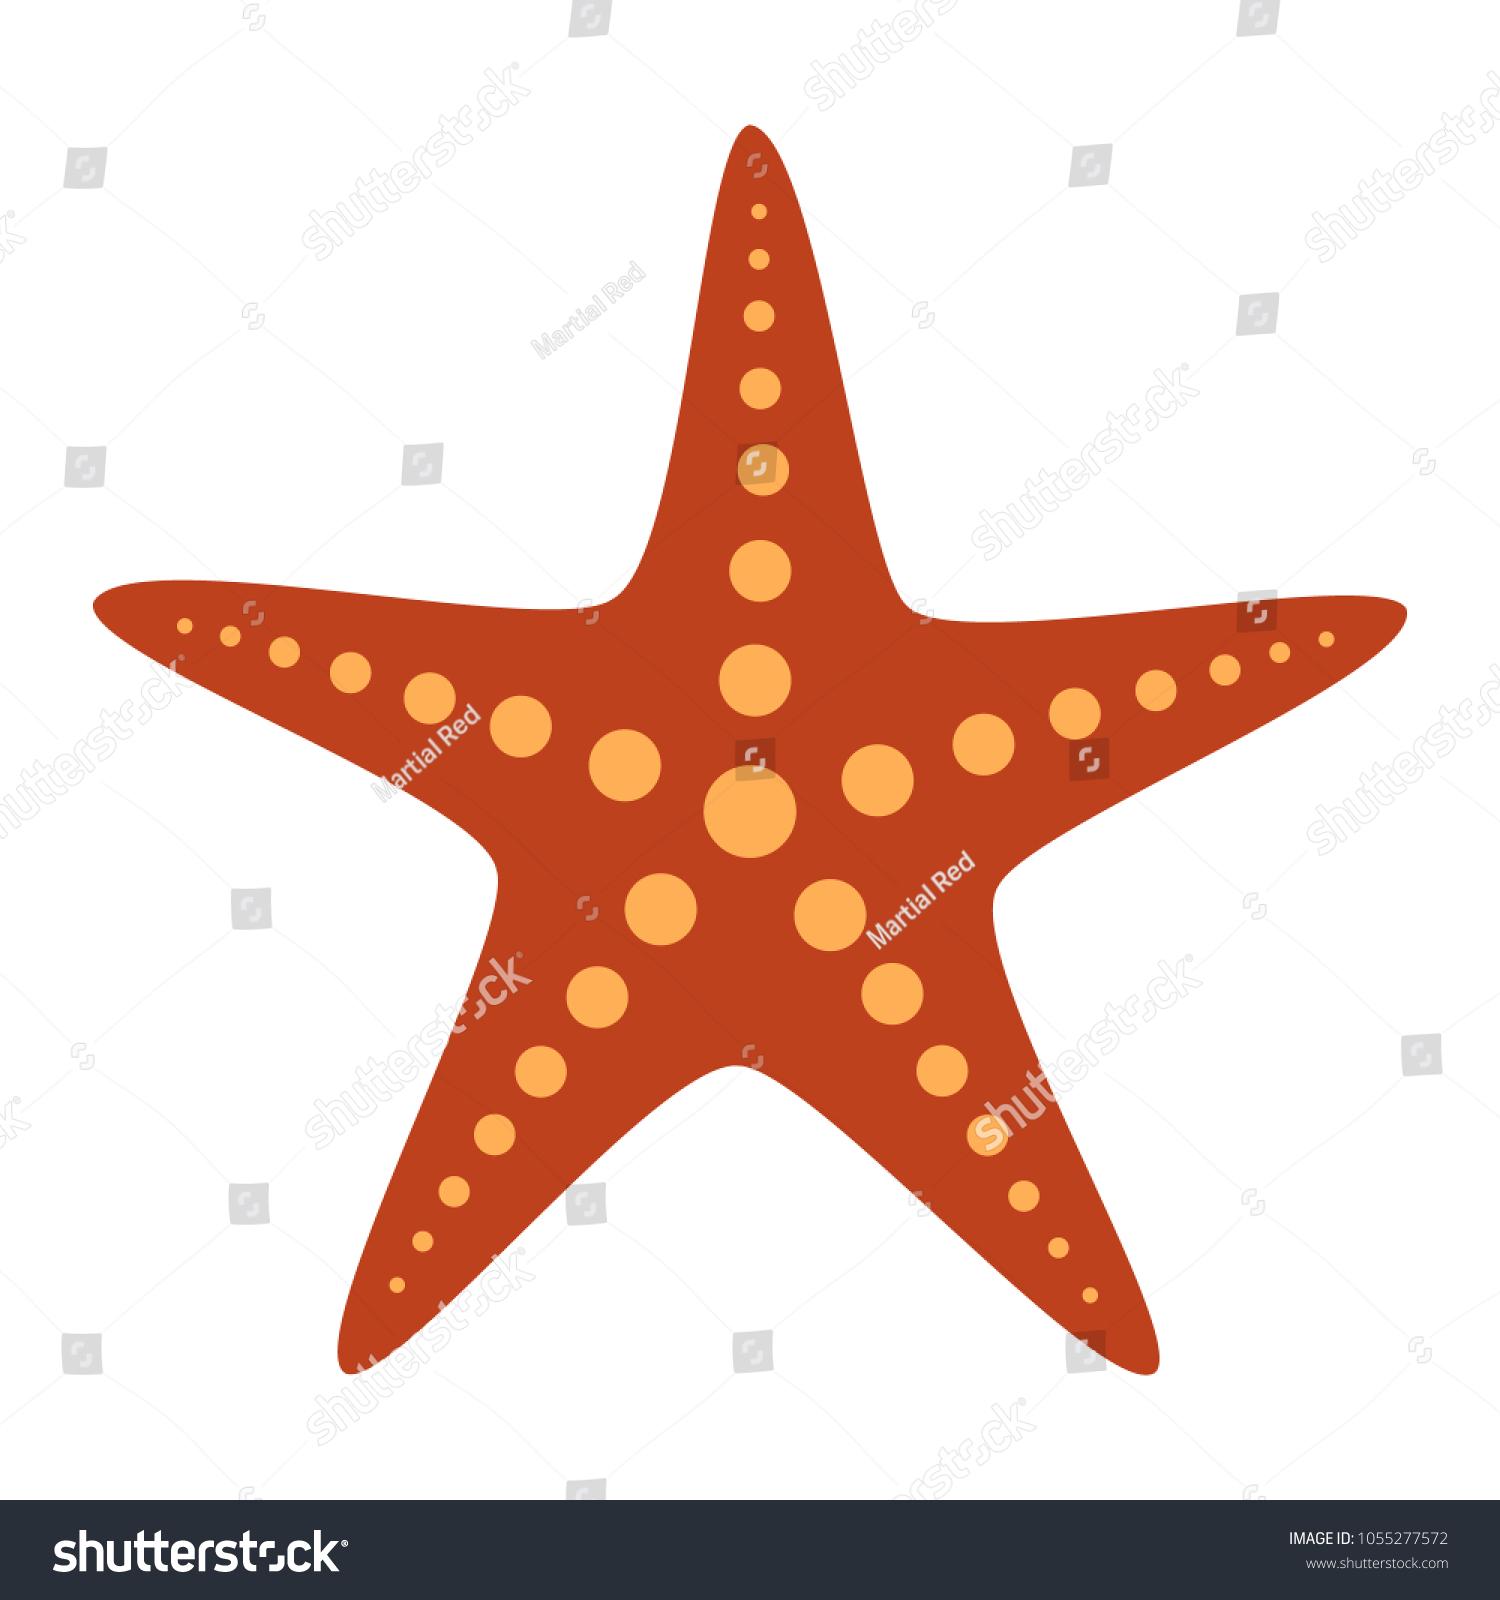 Common Orange Starfish Sea Star Fish Stock Vector HD (Royalty Free ...